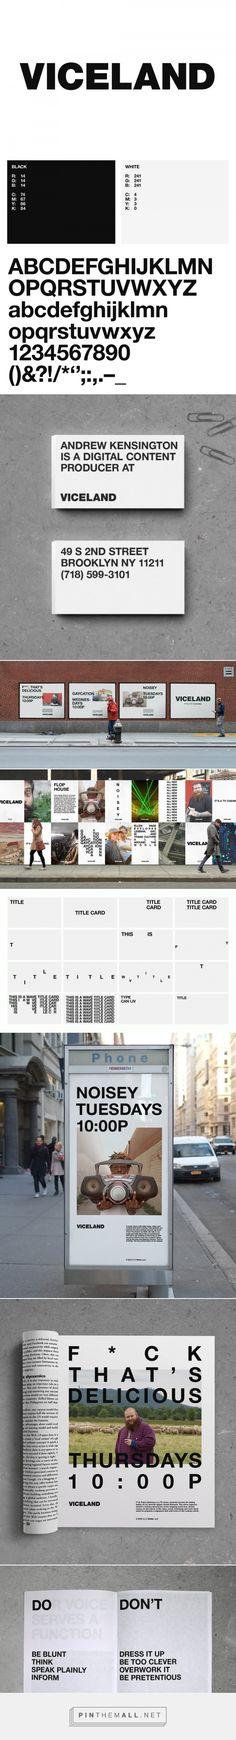 La televisión de Vice se estrena con una identidad totalmente neutra | Brandemia_... - a grouped images picture - Pin Them All